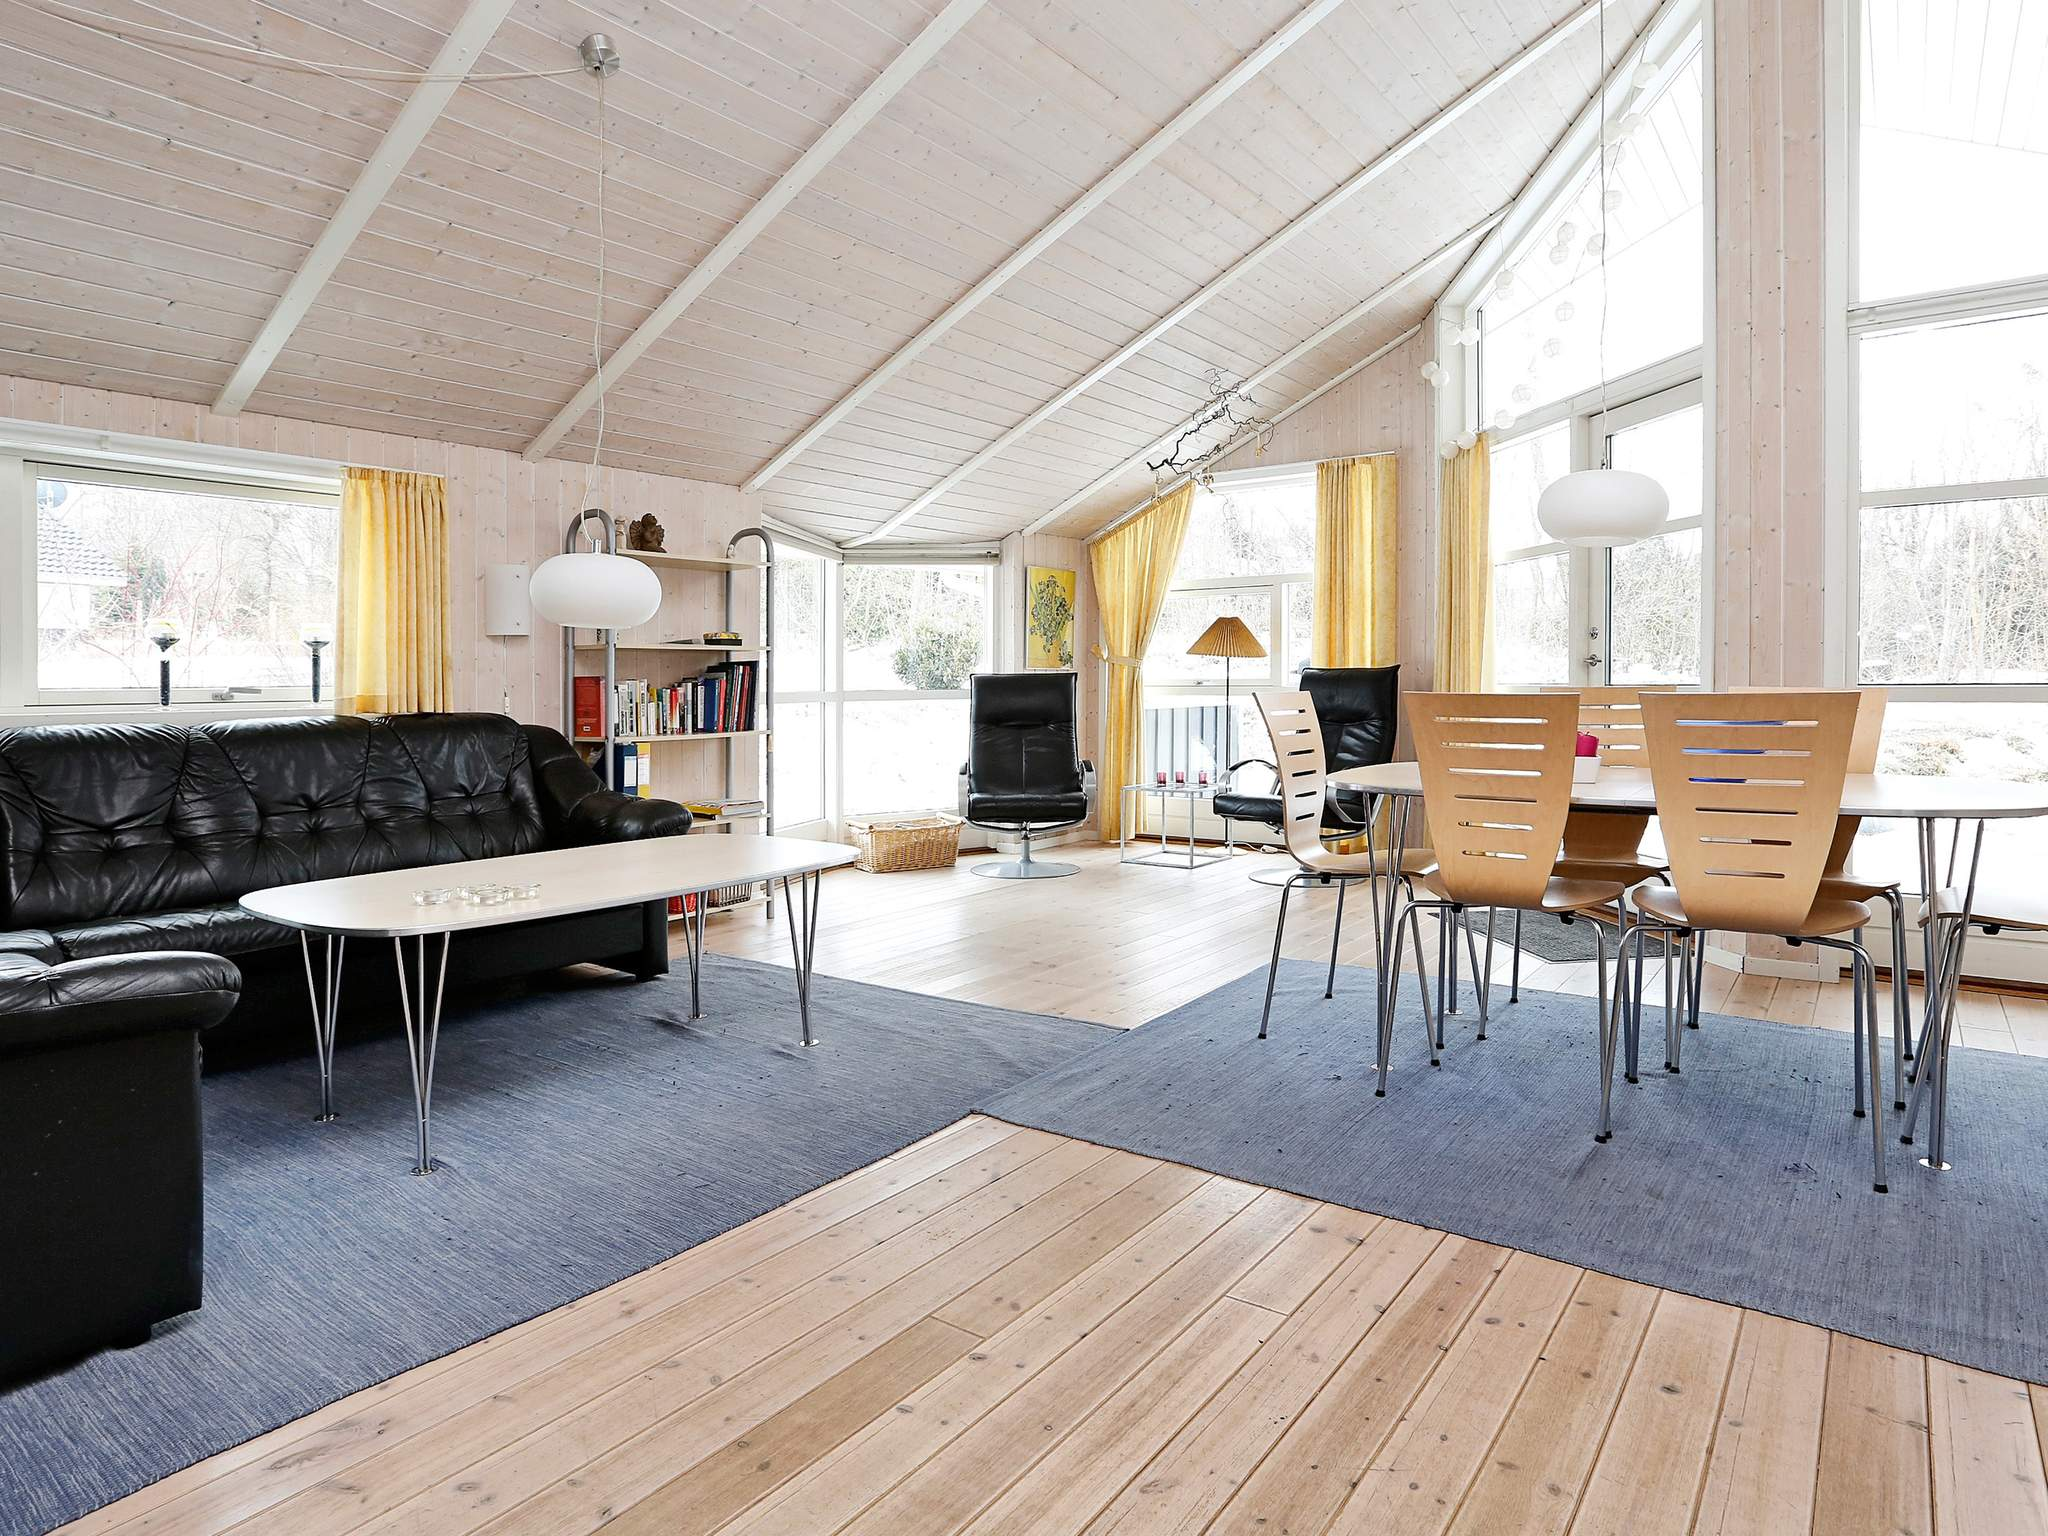 Ferienhaus Smidstrup Strand (86601), Smidstrup, , Nordseeland, Dänemark, Bild 15